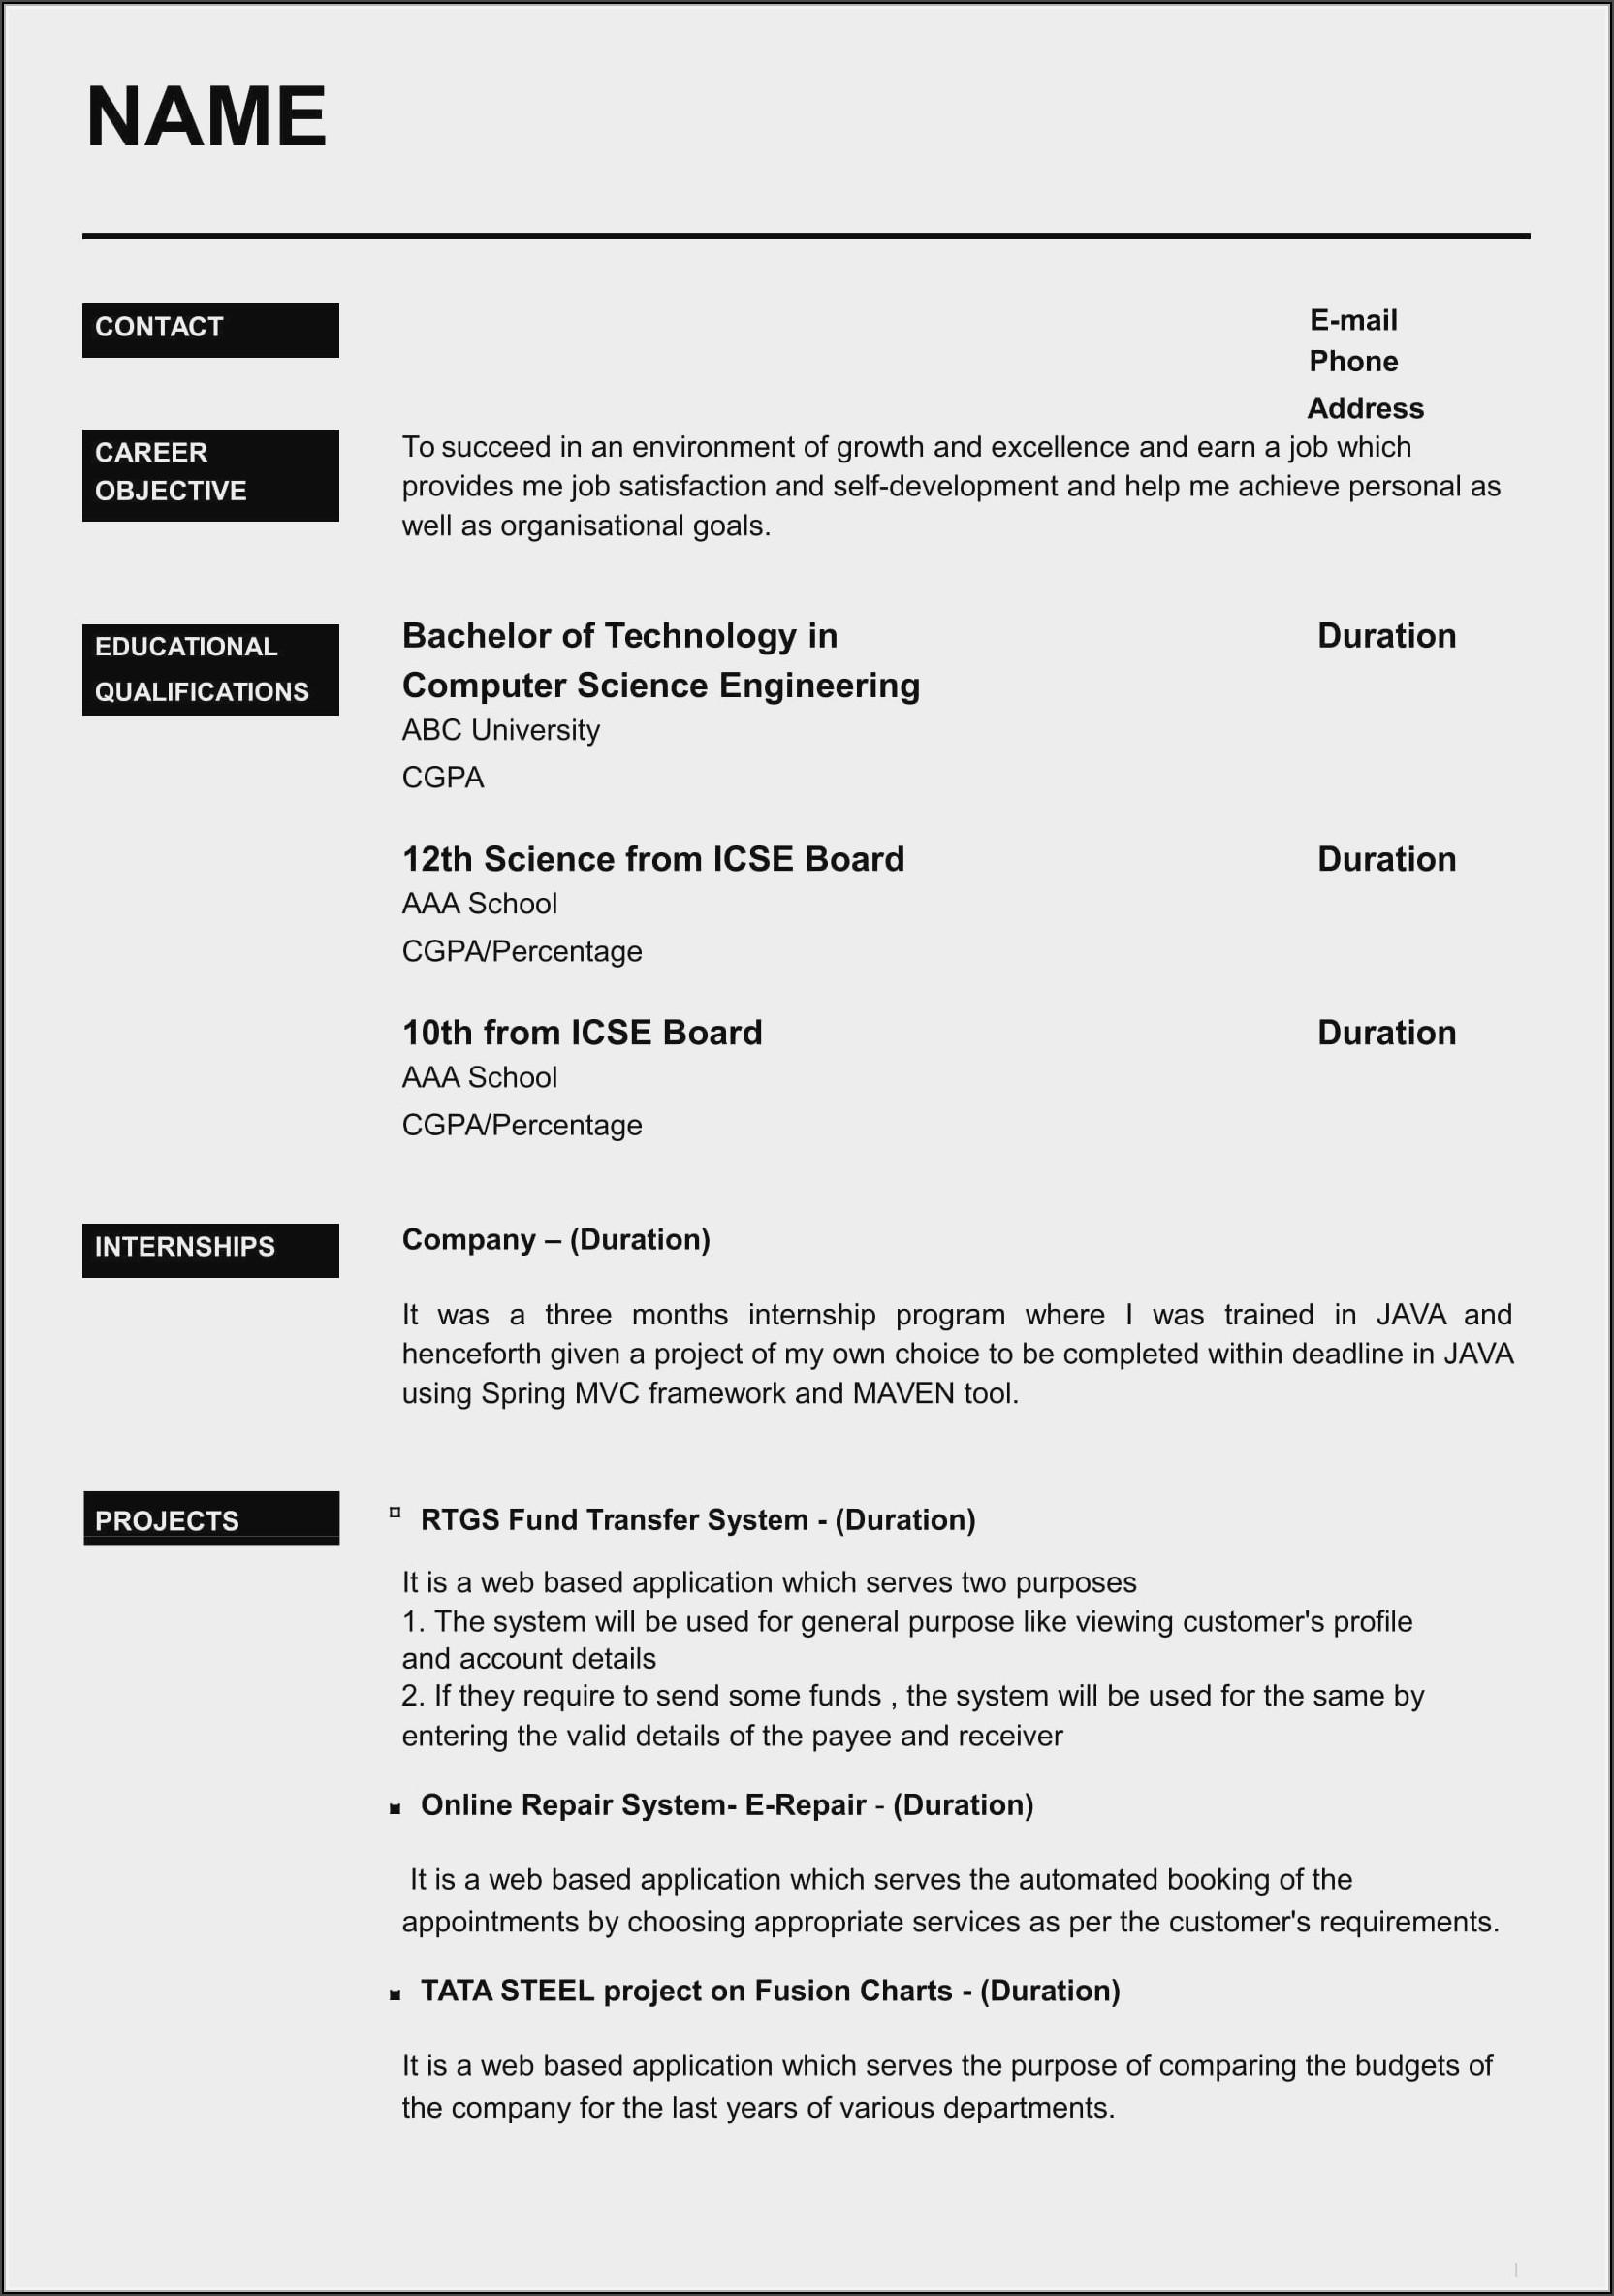 Sample Resume Format Download In Ms Word